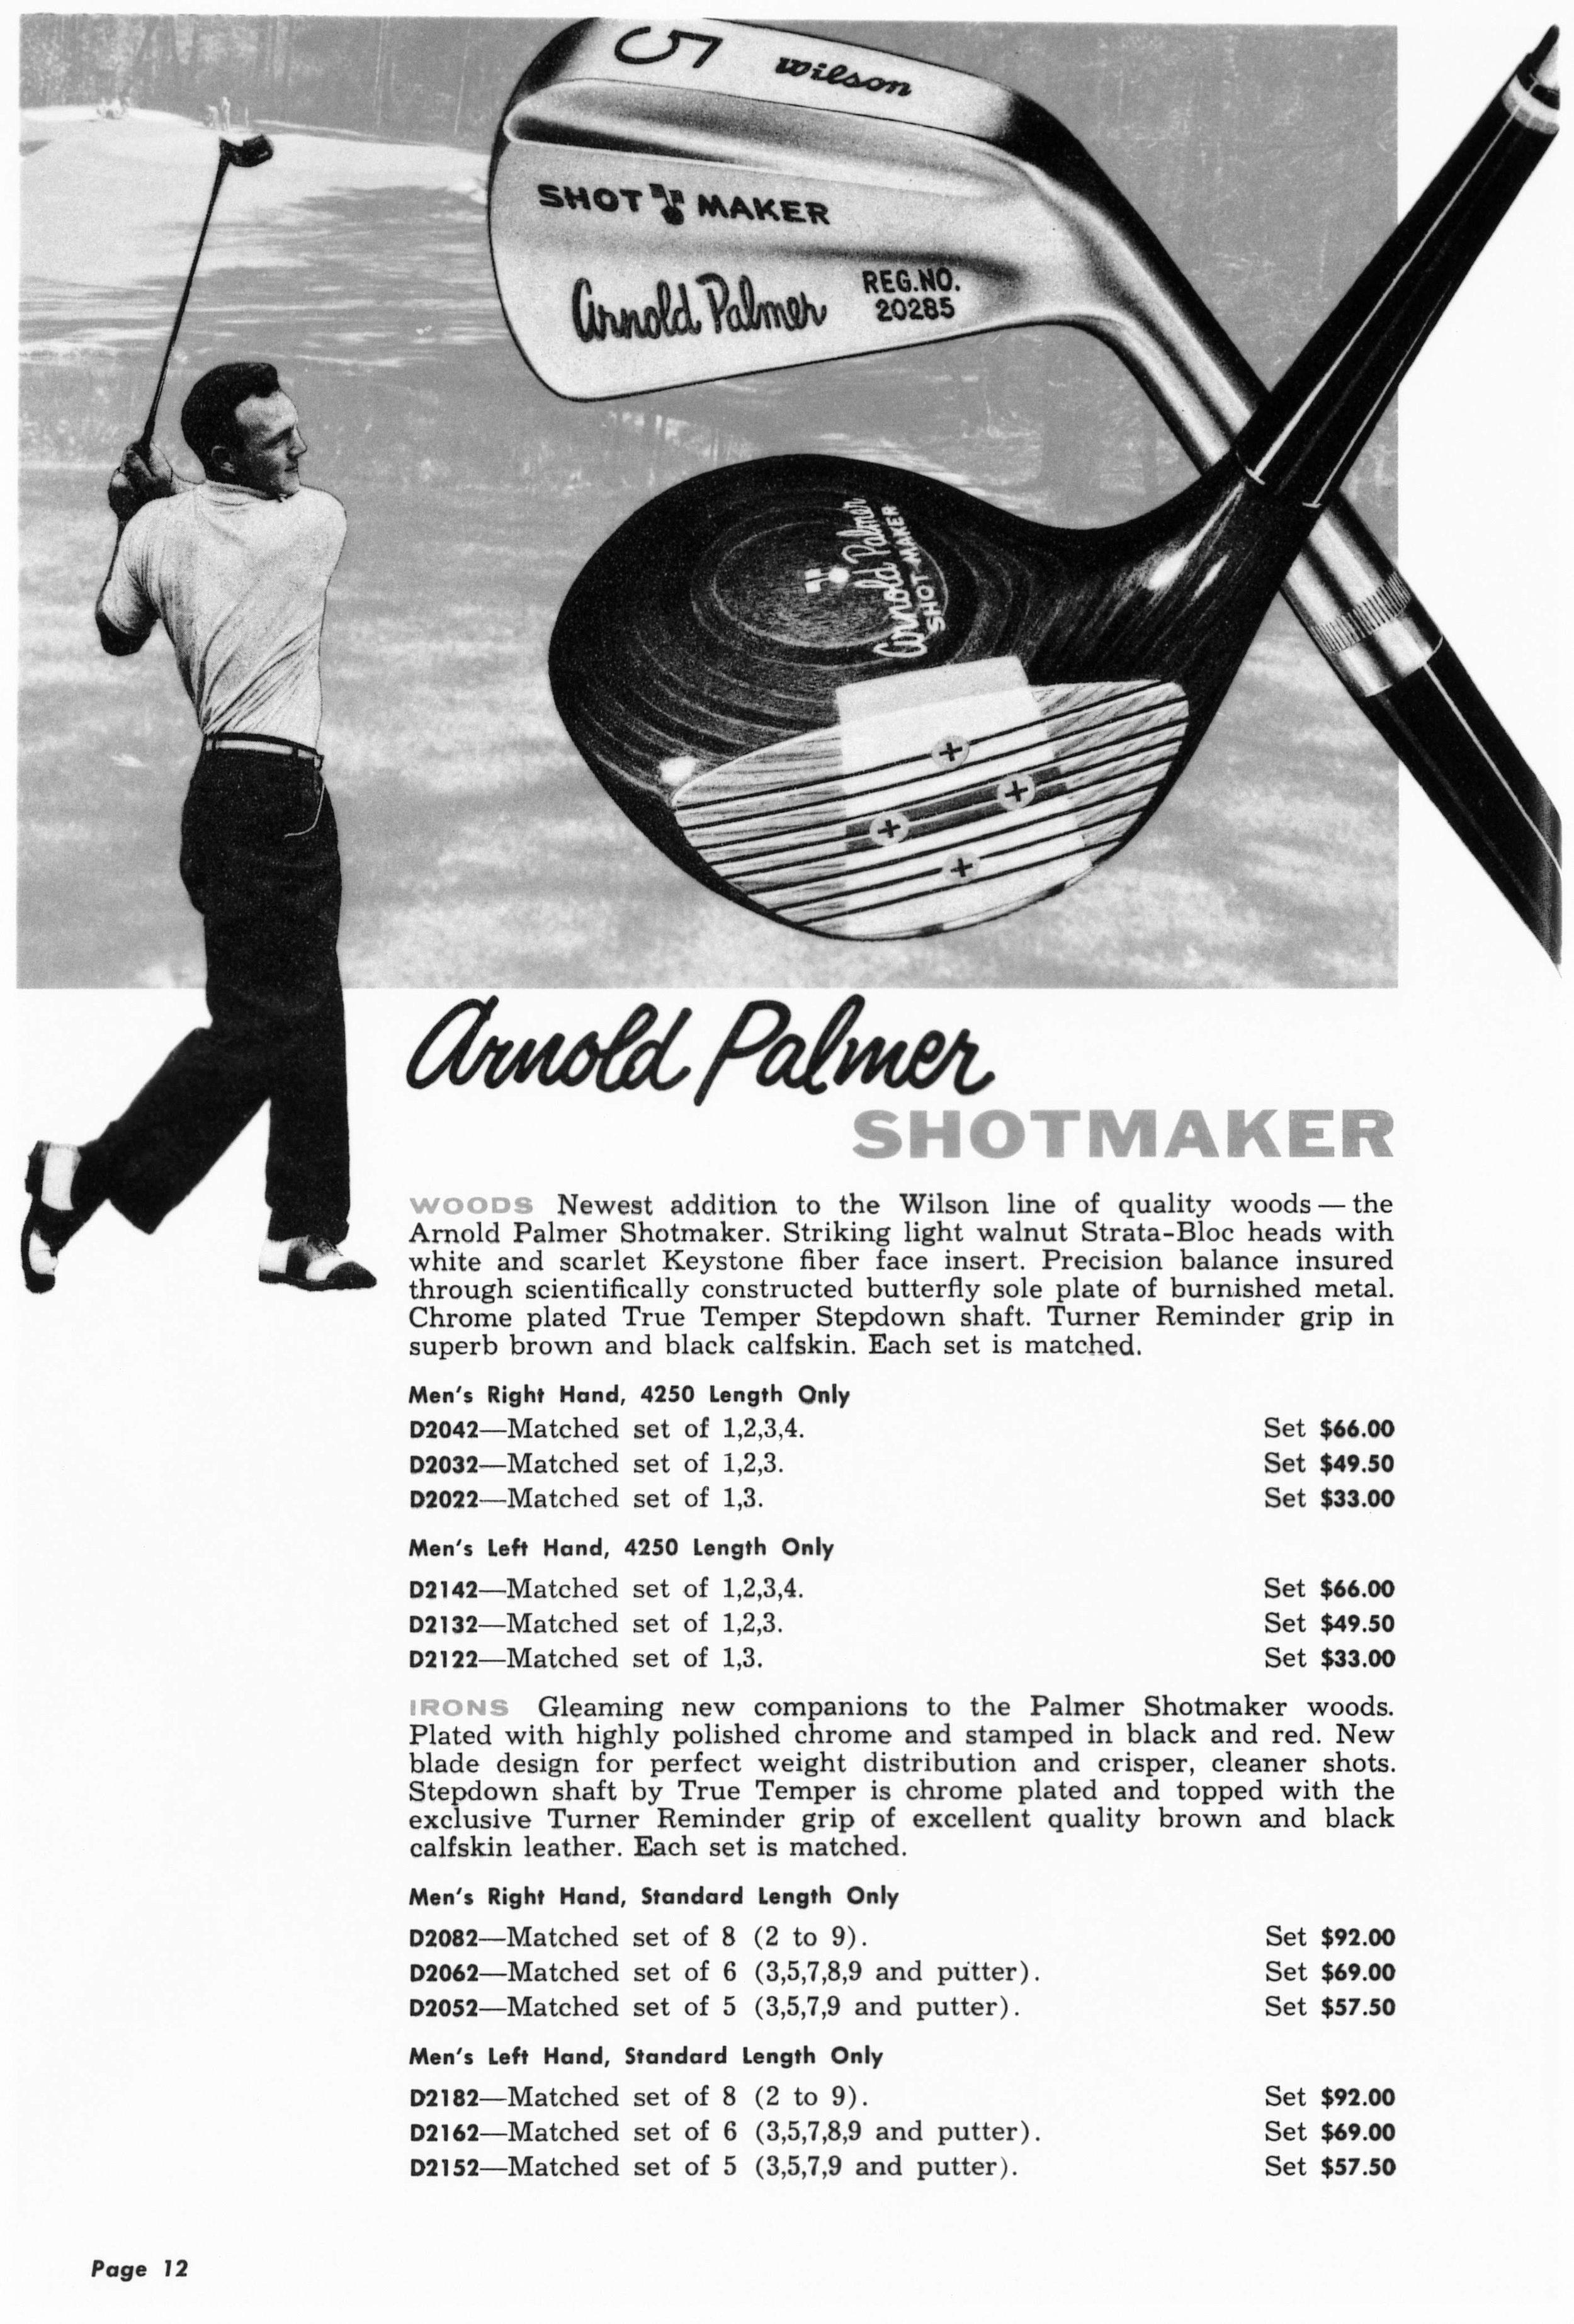 Arnold_Palmer_ShotMaker (1).jpg